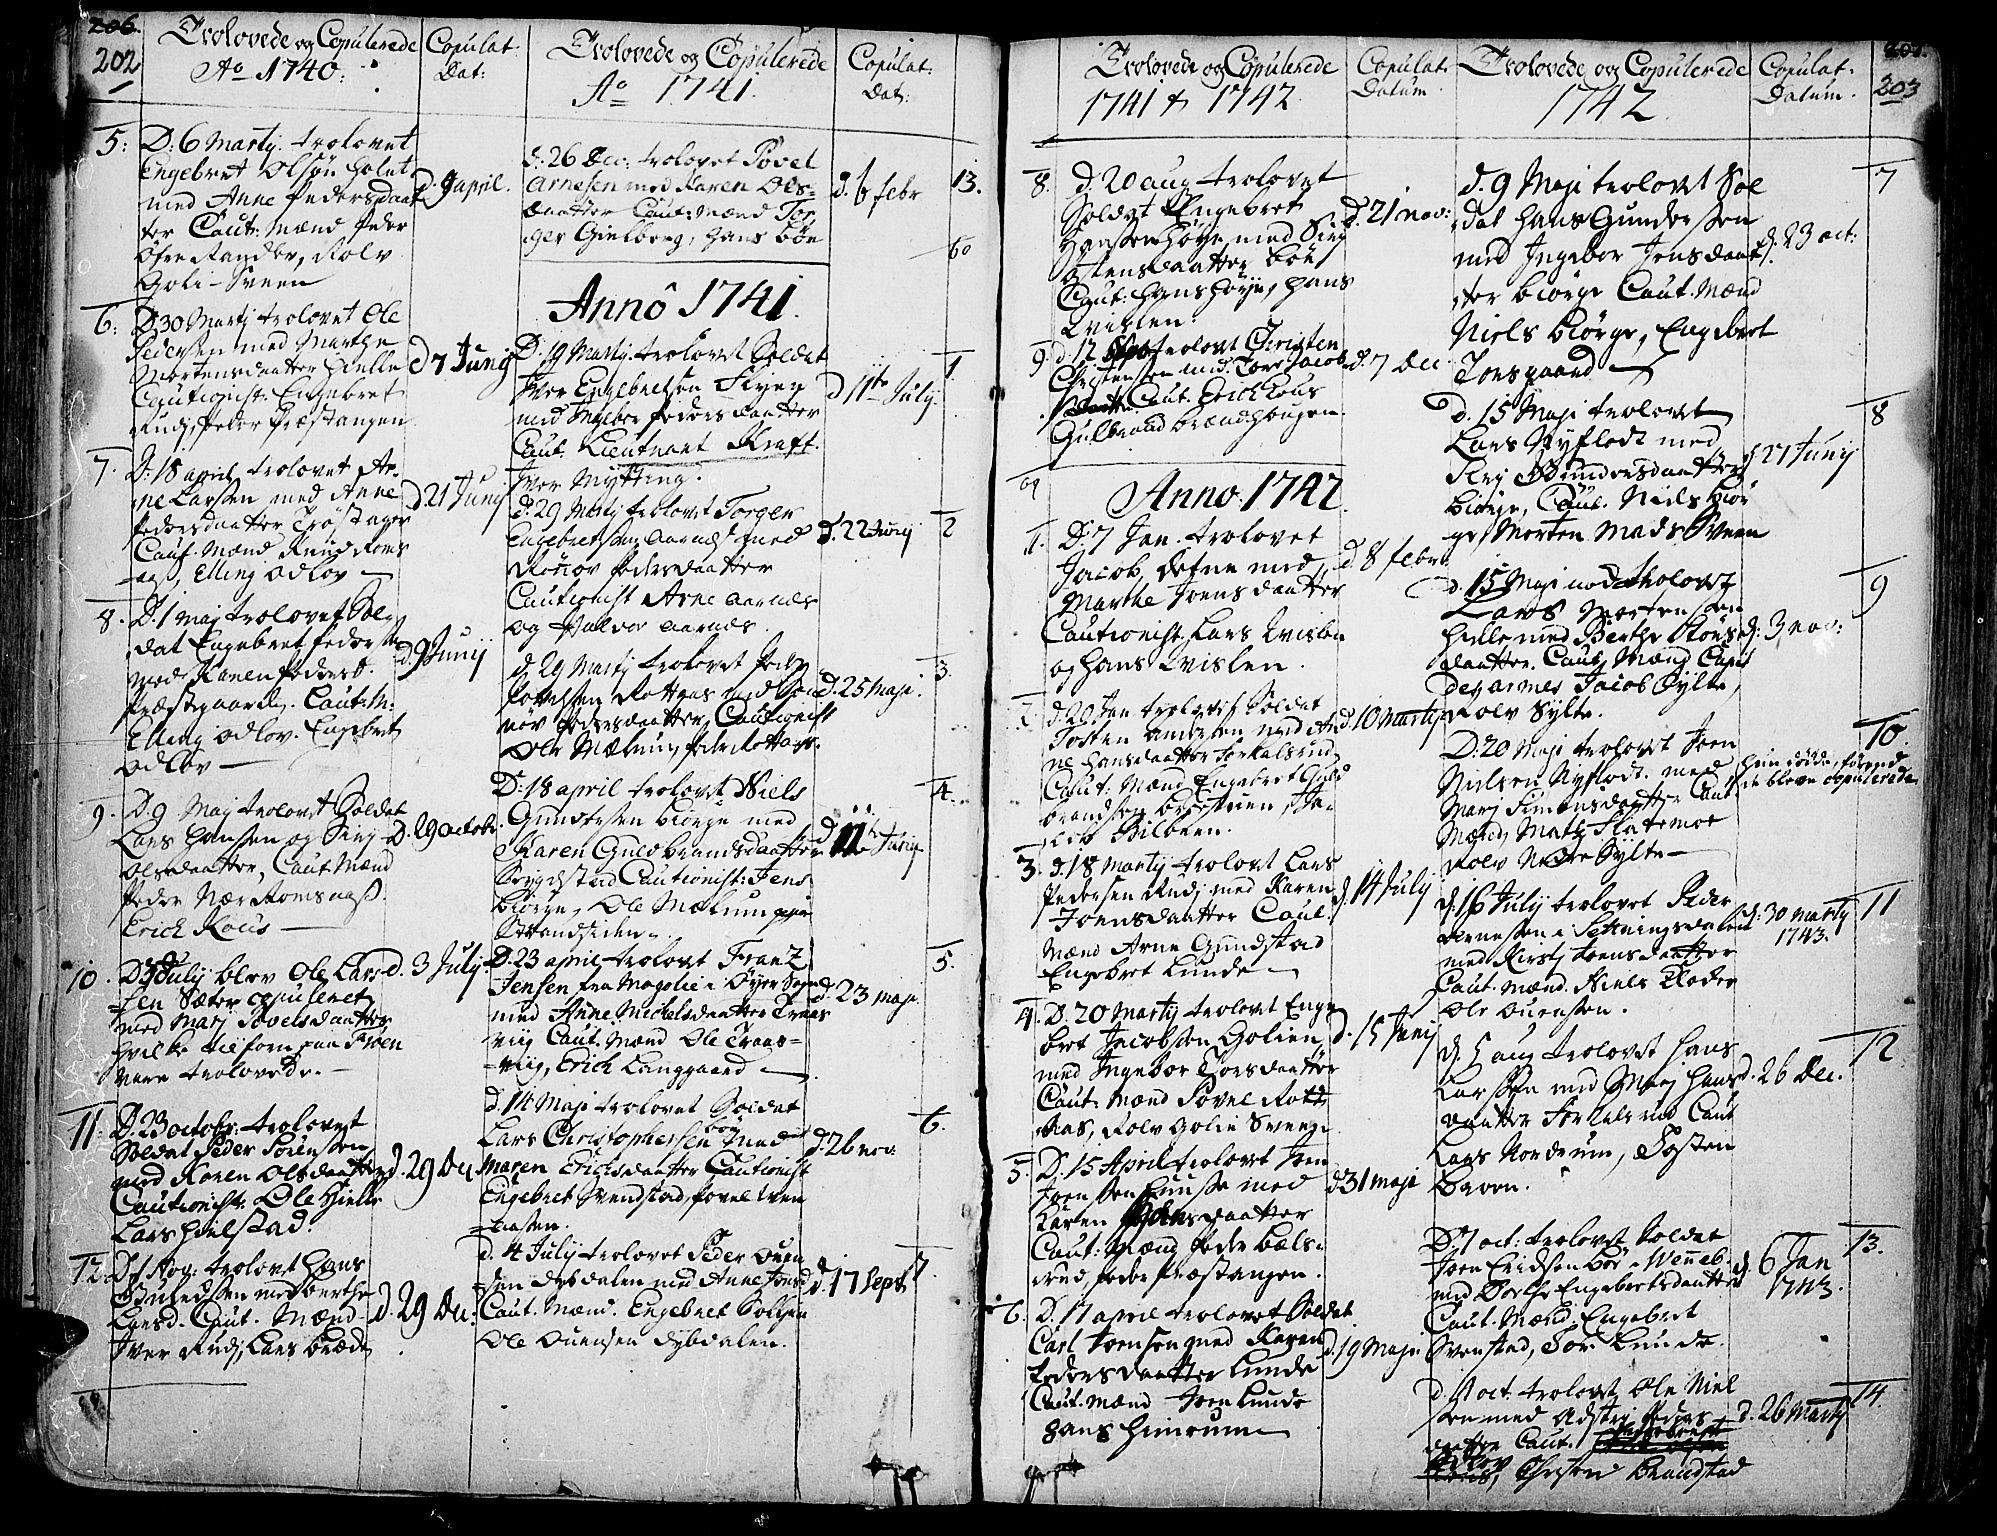 SAH, Ringebu prestekontor, Ministerialbok nr. 2, 1734-1780, s. 202-203